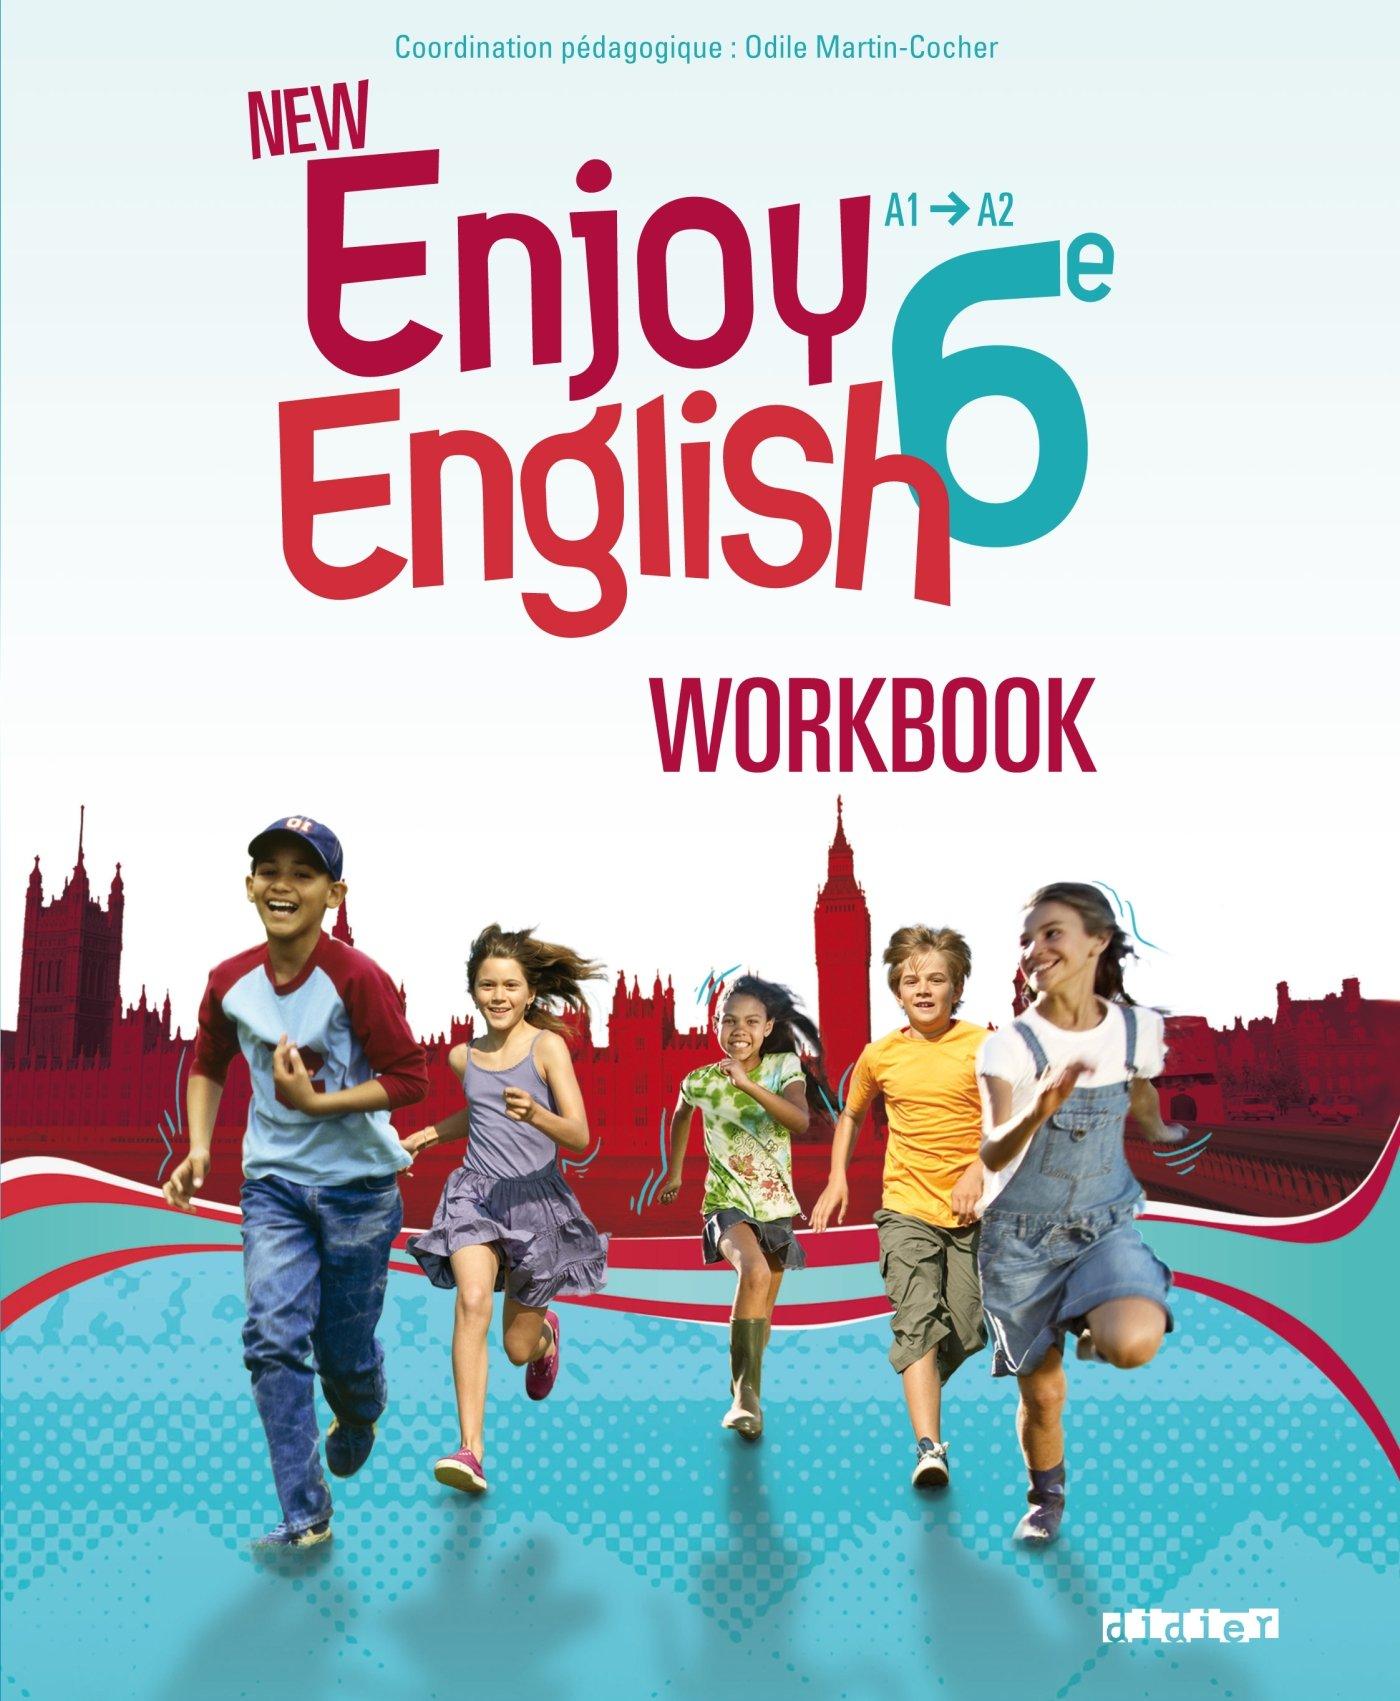 New Enjoy English 6e - Workbook Broché – 4 mai 2011 Sophie Plays Catherine Marcangeli Elodie Vialleton Odile Martin-Cocher